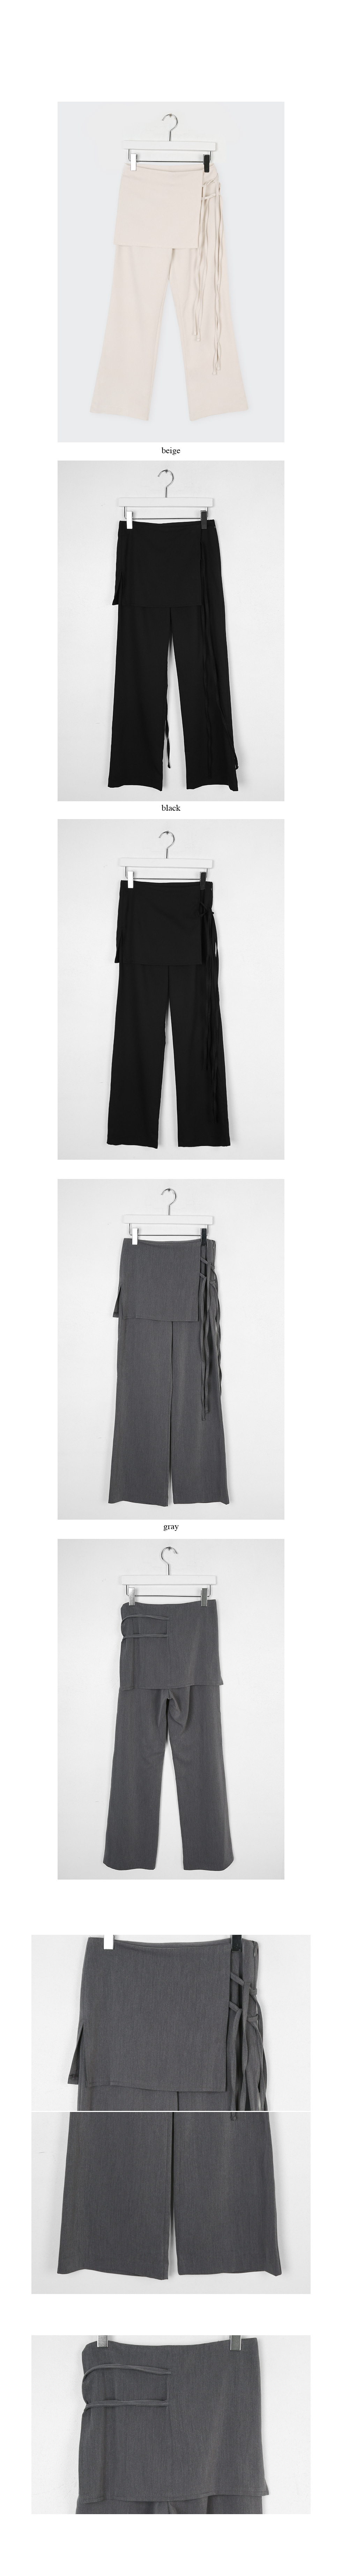 urban strap forming pants